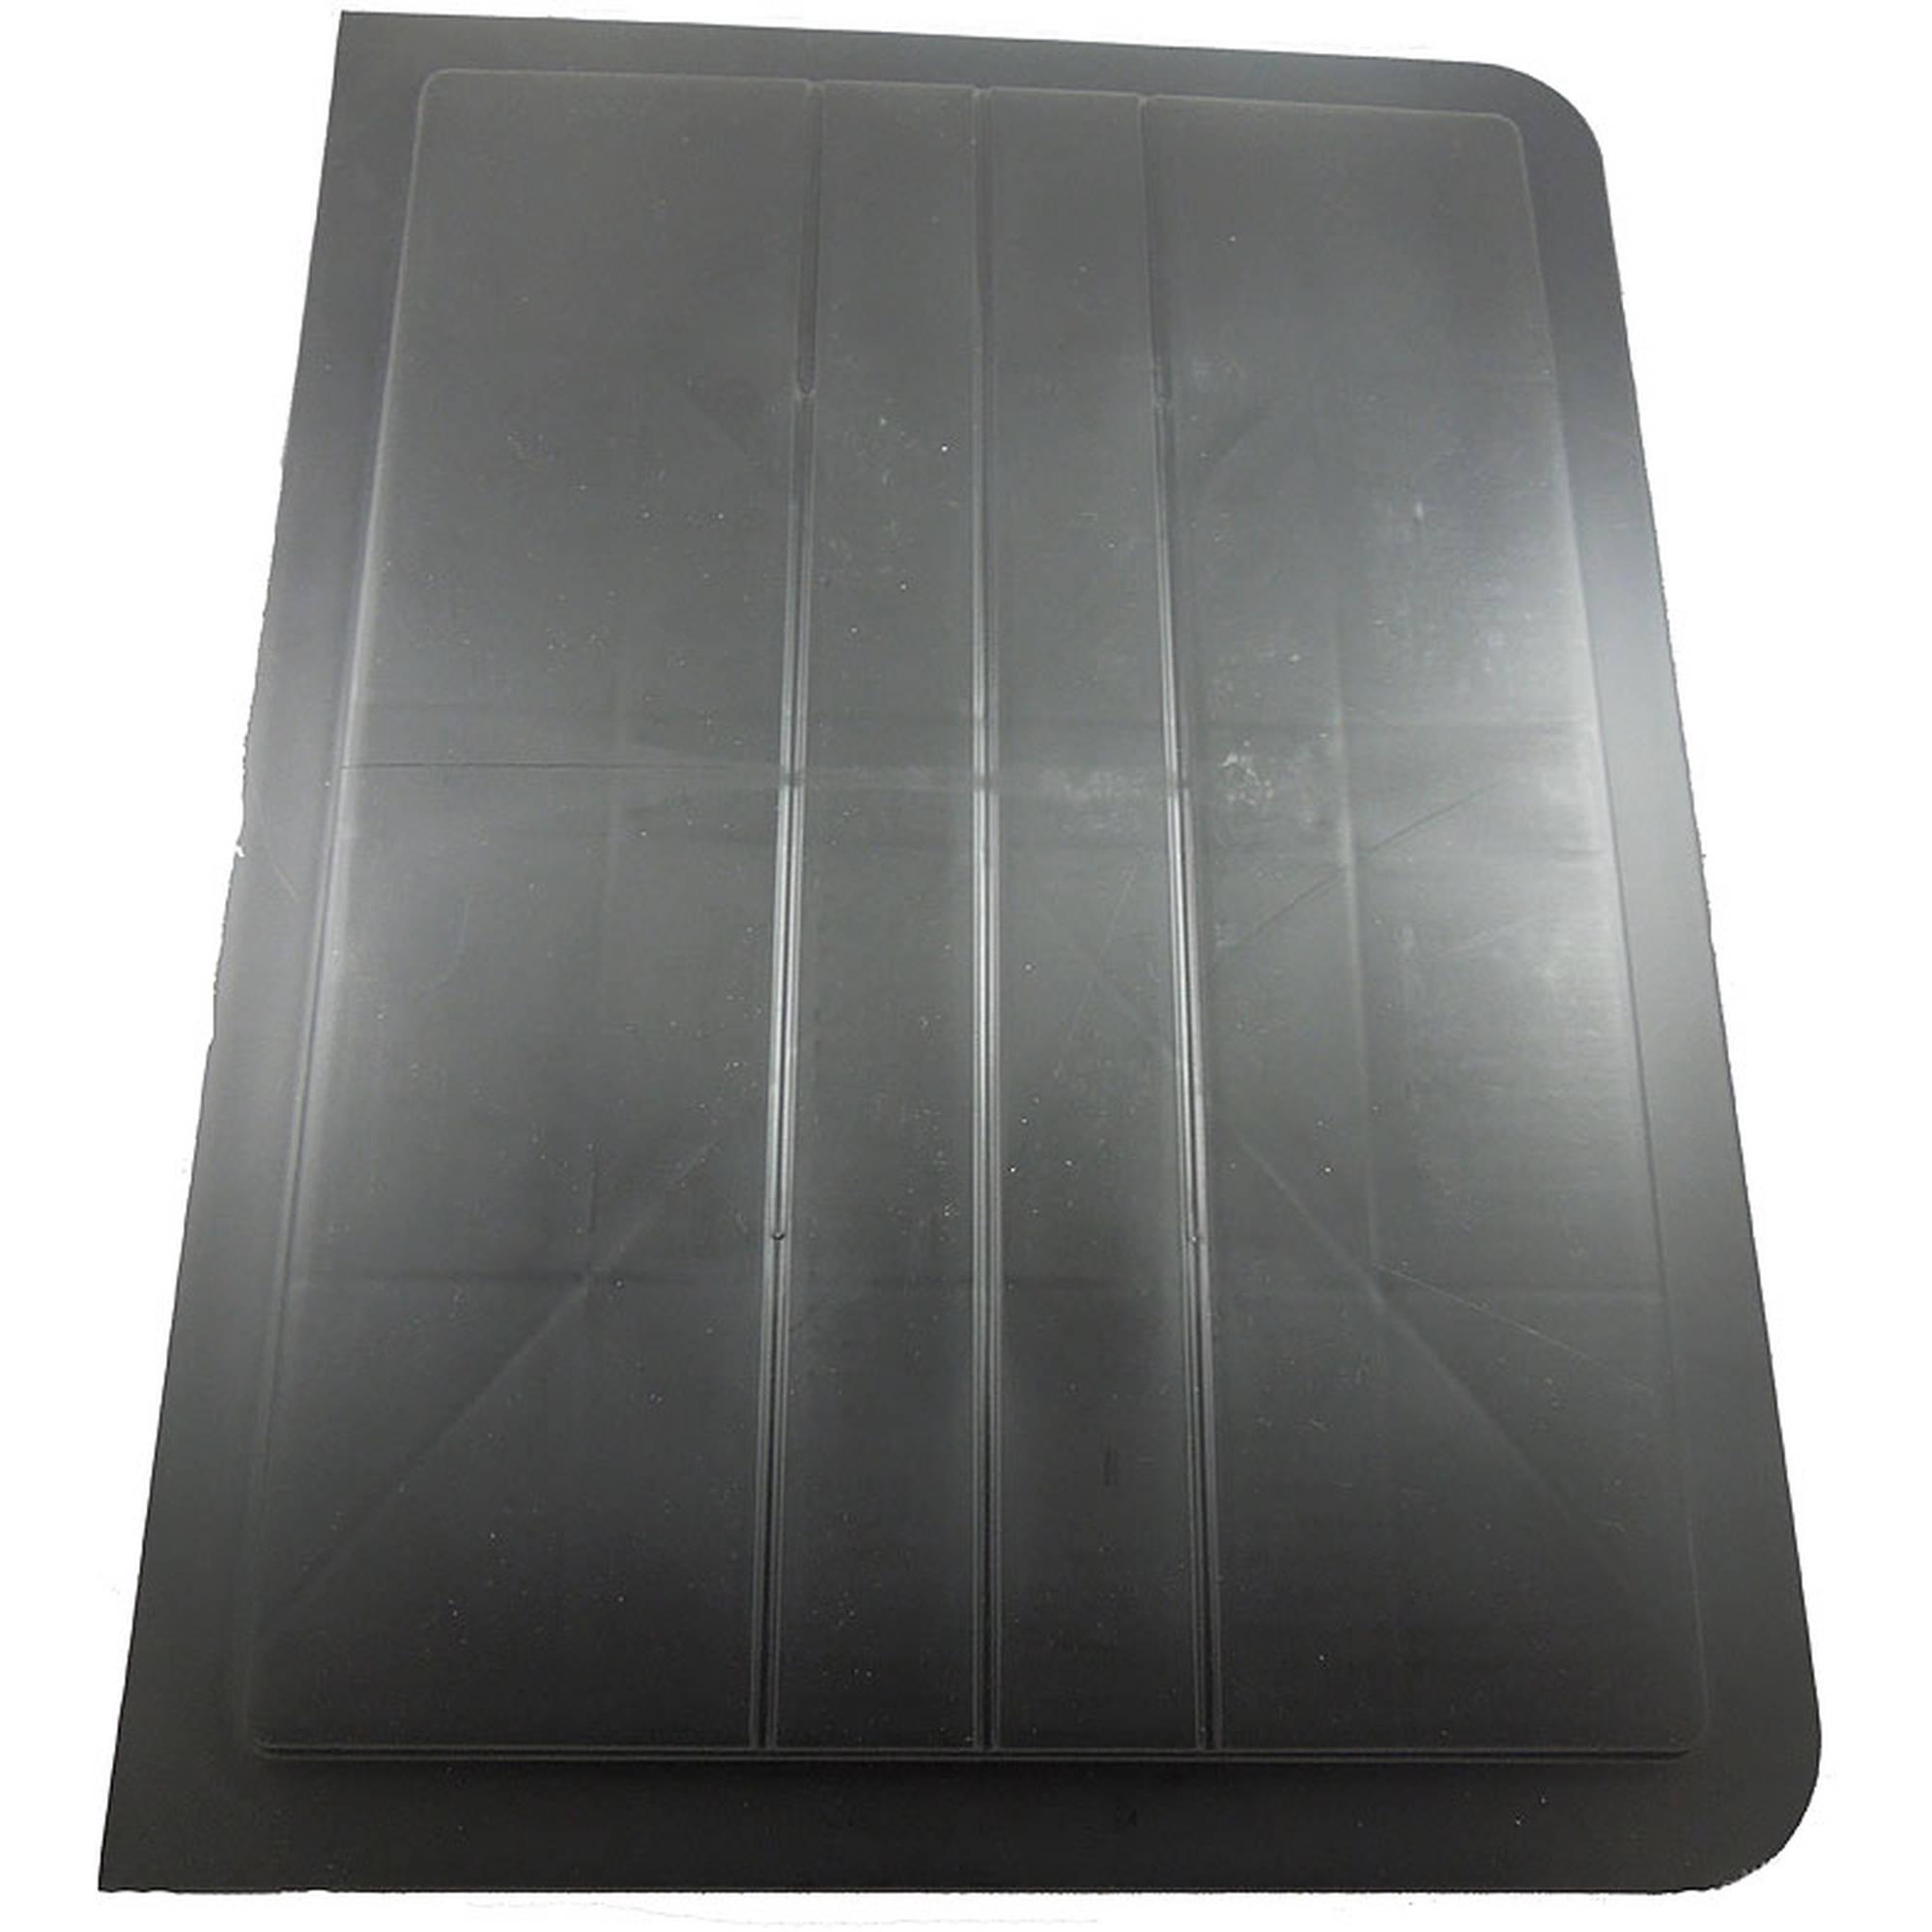 Filterdeckel F30000-00/FPU36000-00